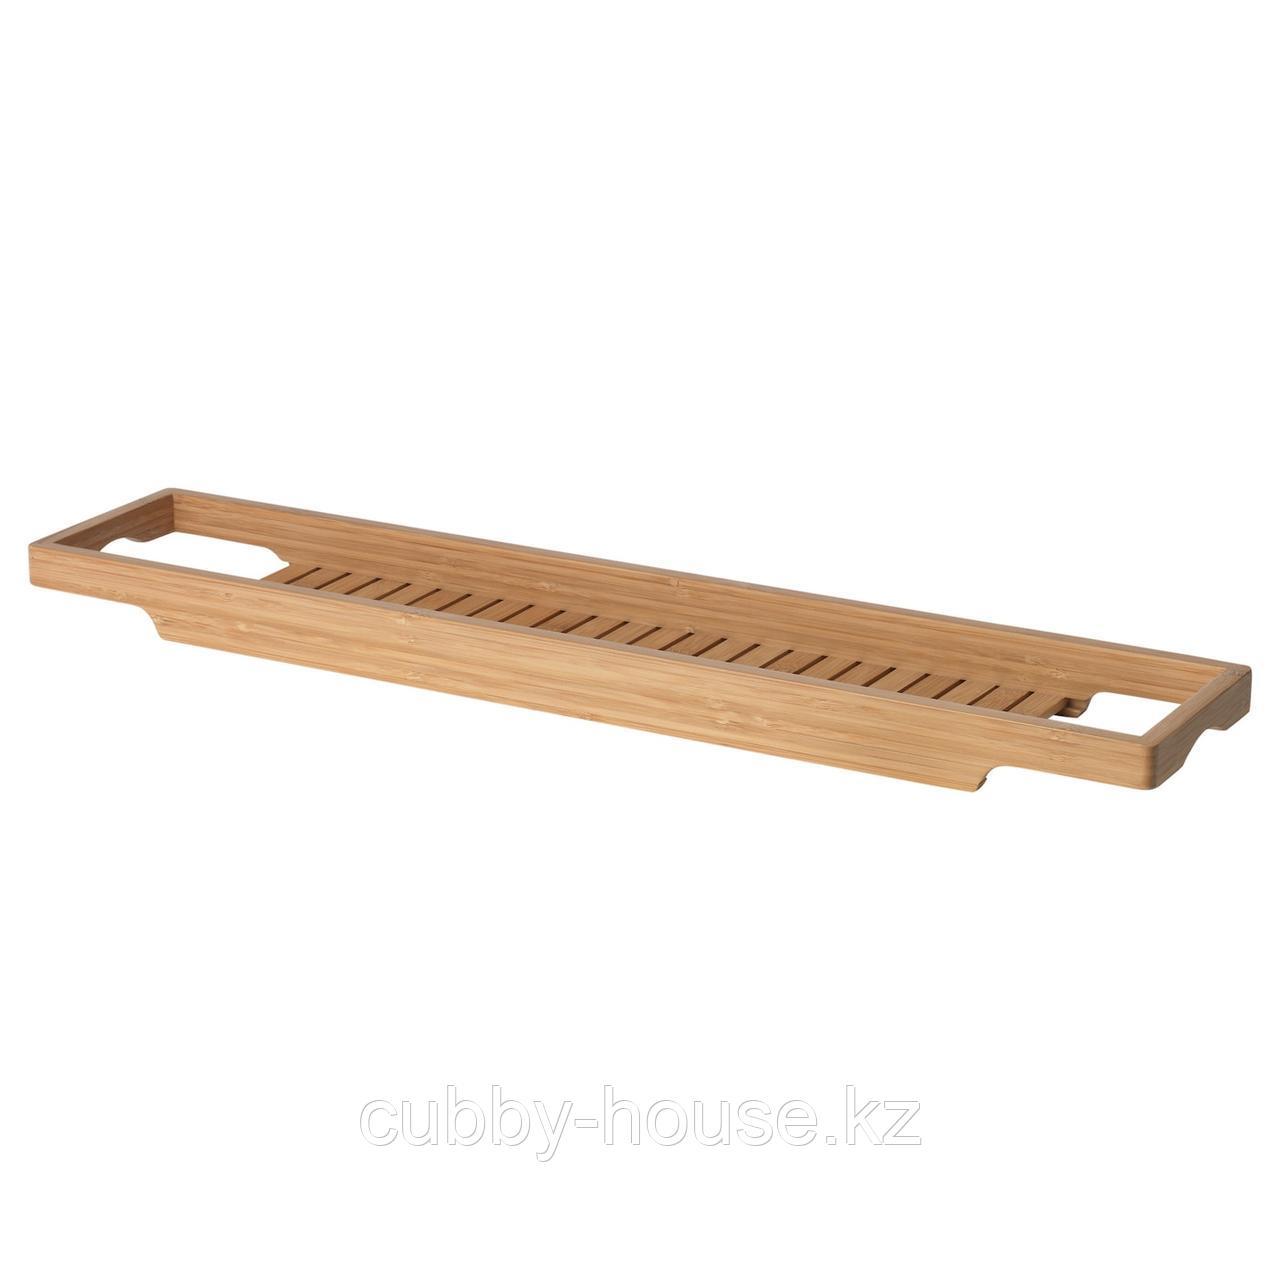 ХАВЕРН Полка для ванны, бамбук, 70 см